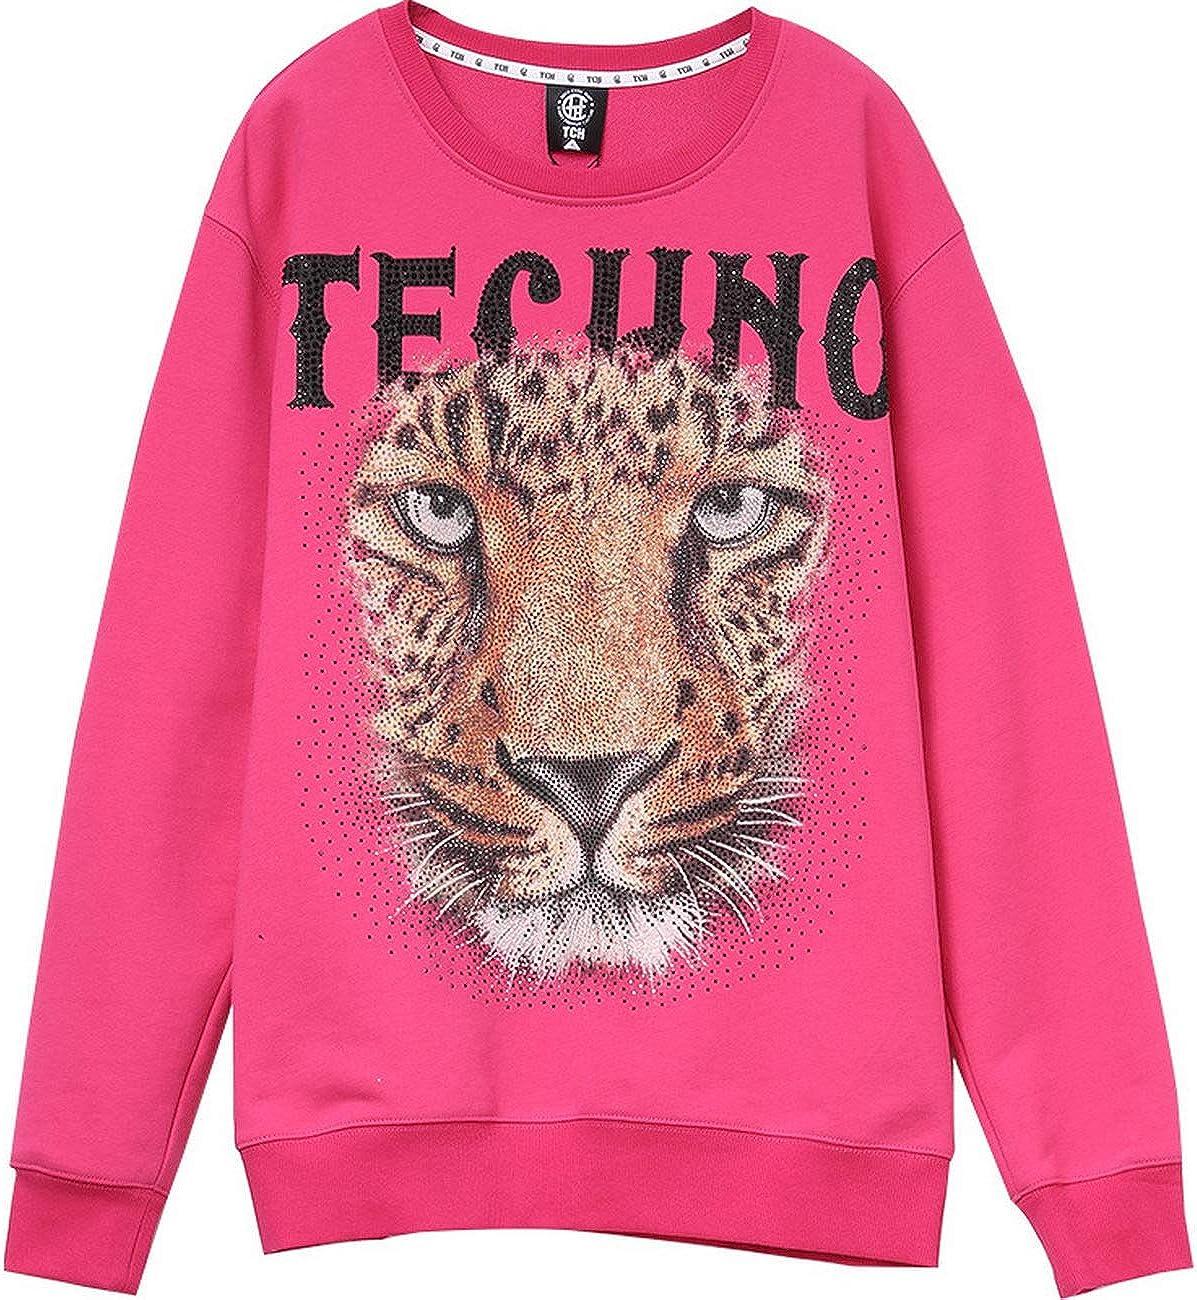 Light Luxury Tide Brand Big C hot Beads Sweater Men and Women T203116026